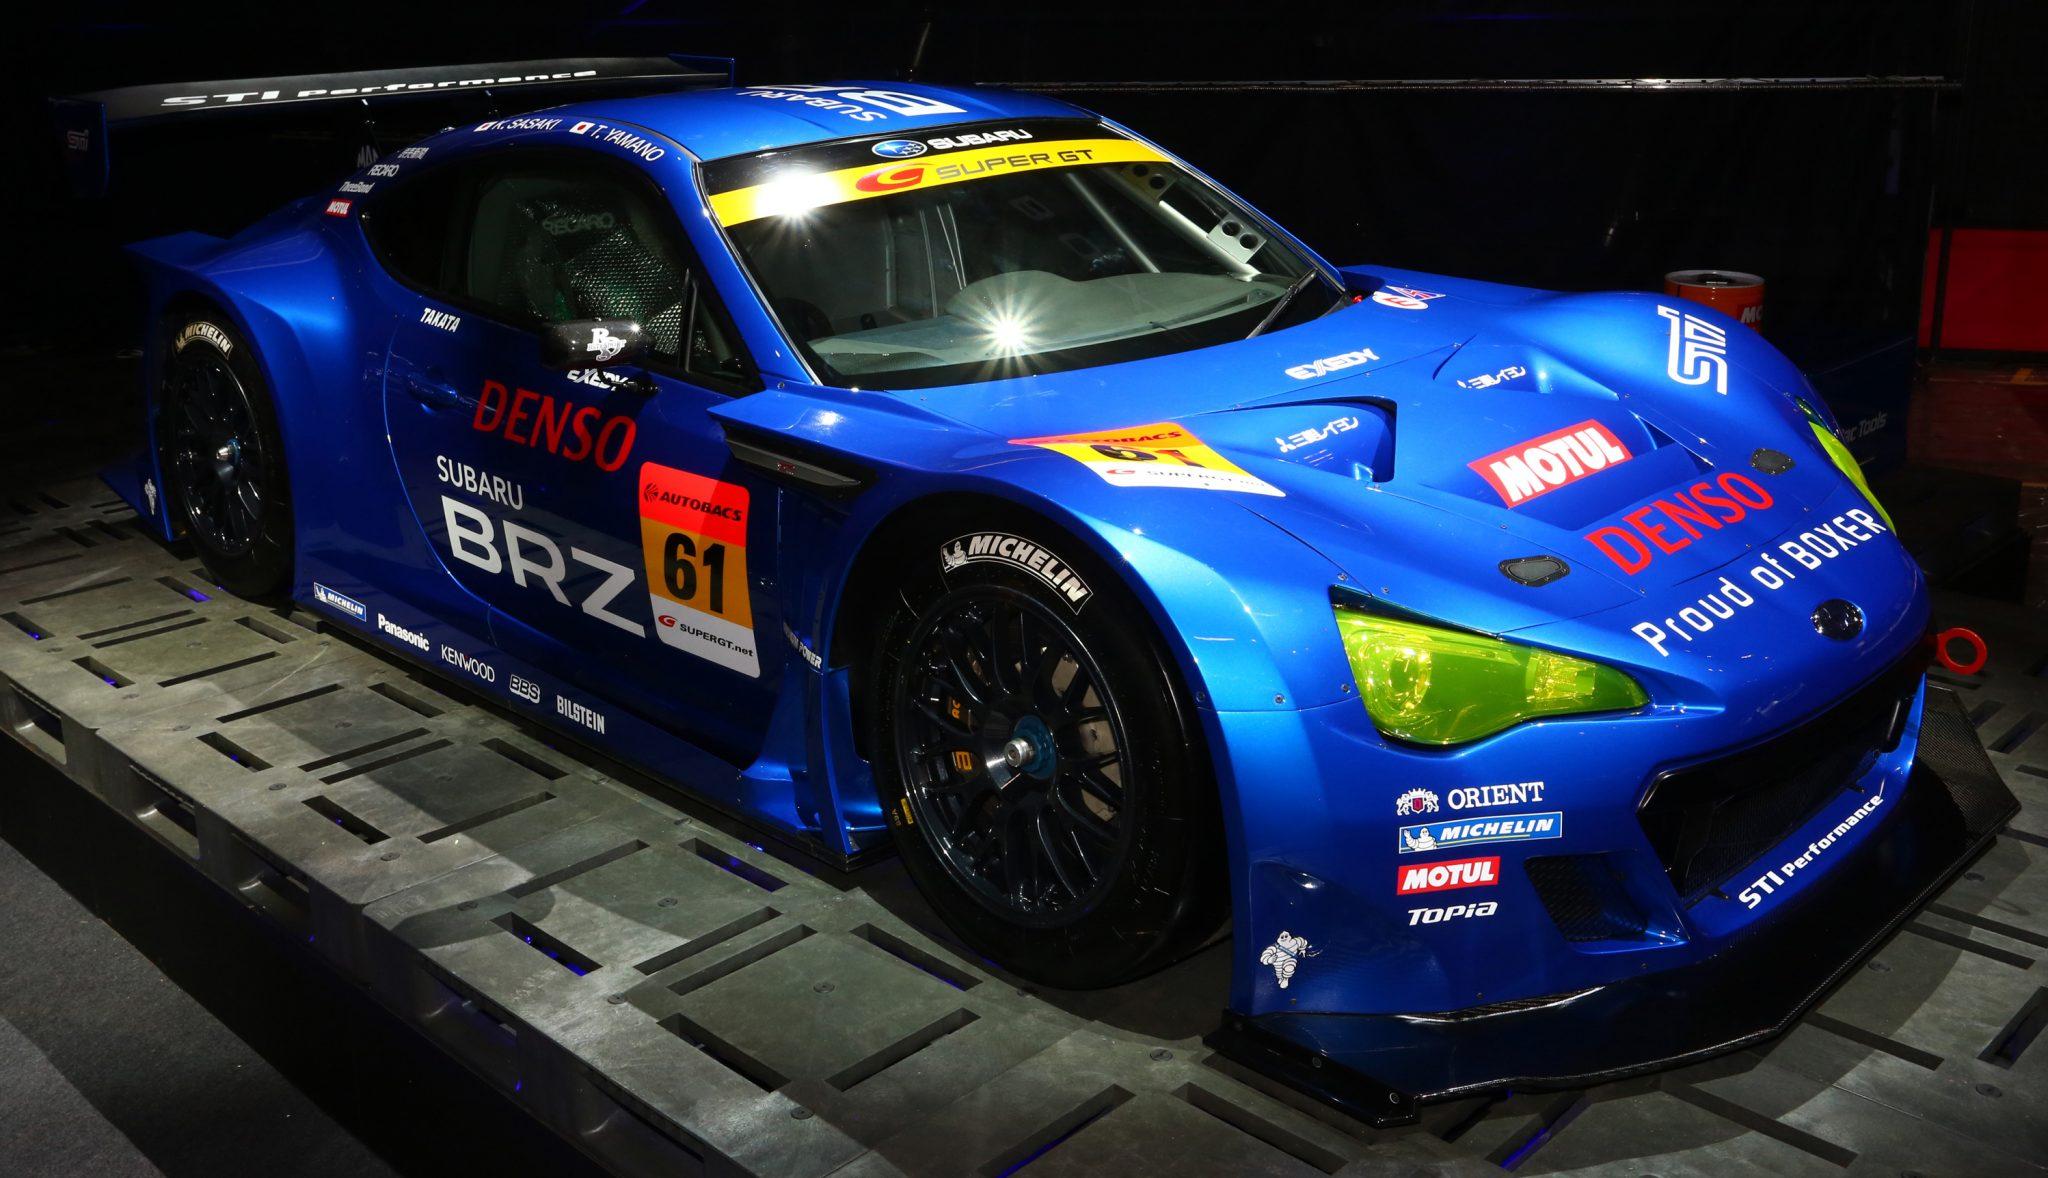 2013 SUPER GT 300 SUBARU BRZ